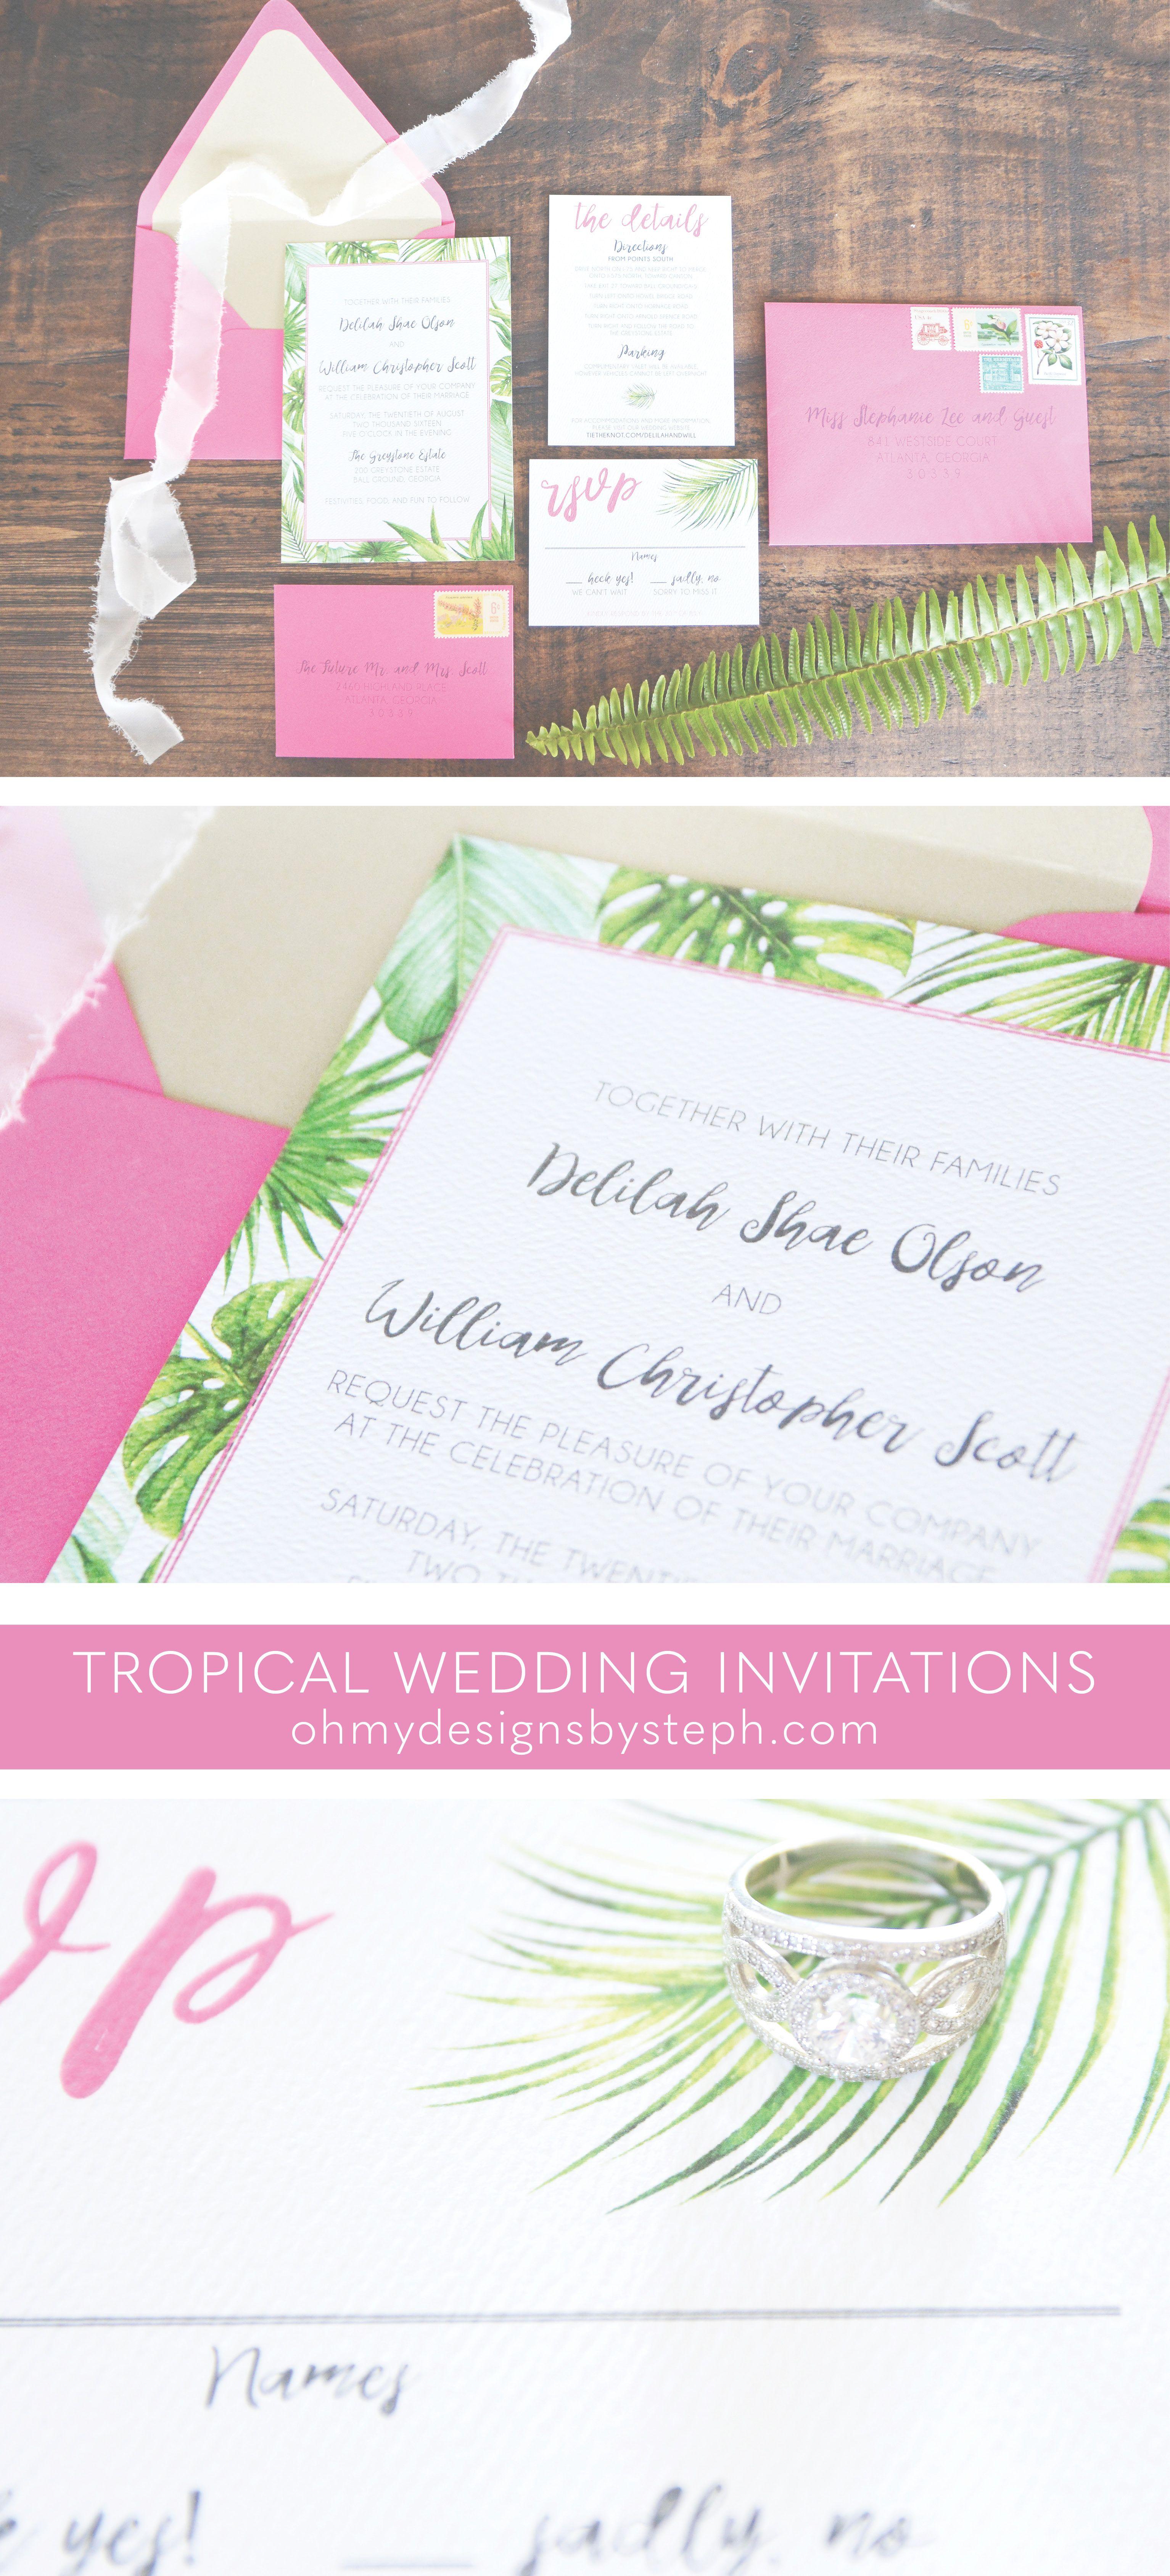 Tropical Wedding Invitation | Hot Pink Fiesta Wedding Invitations ...